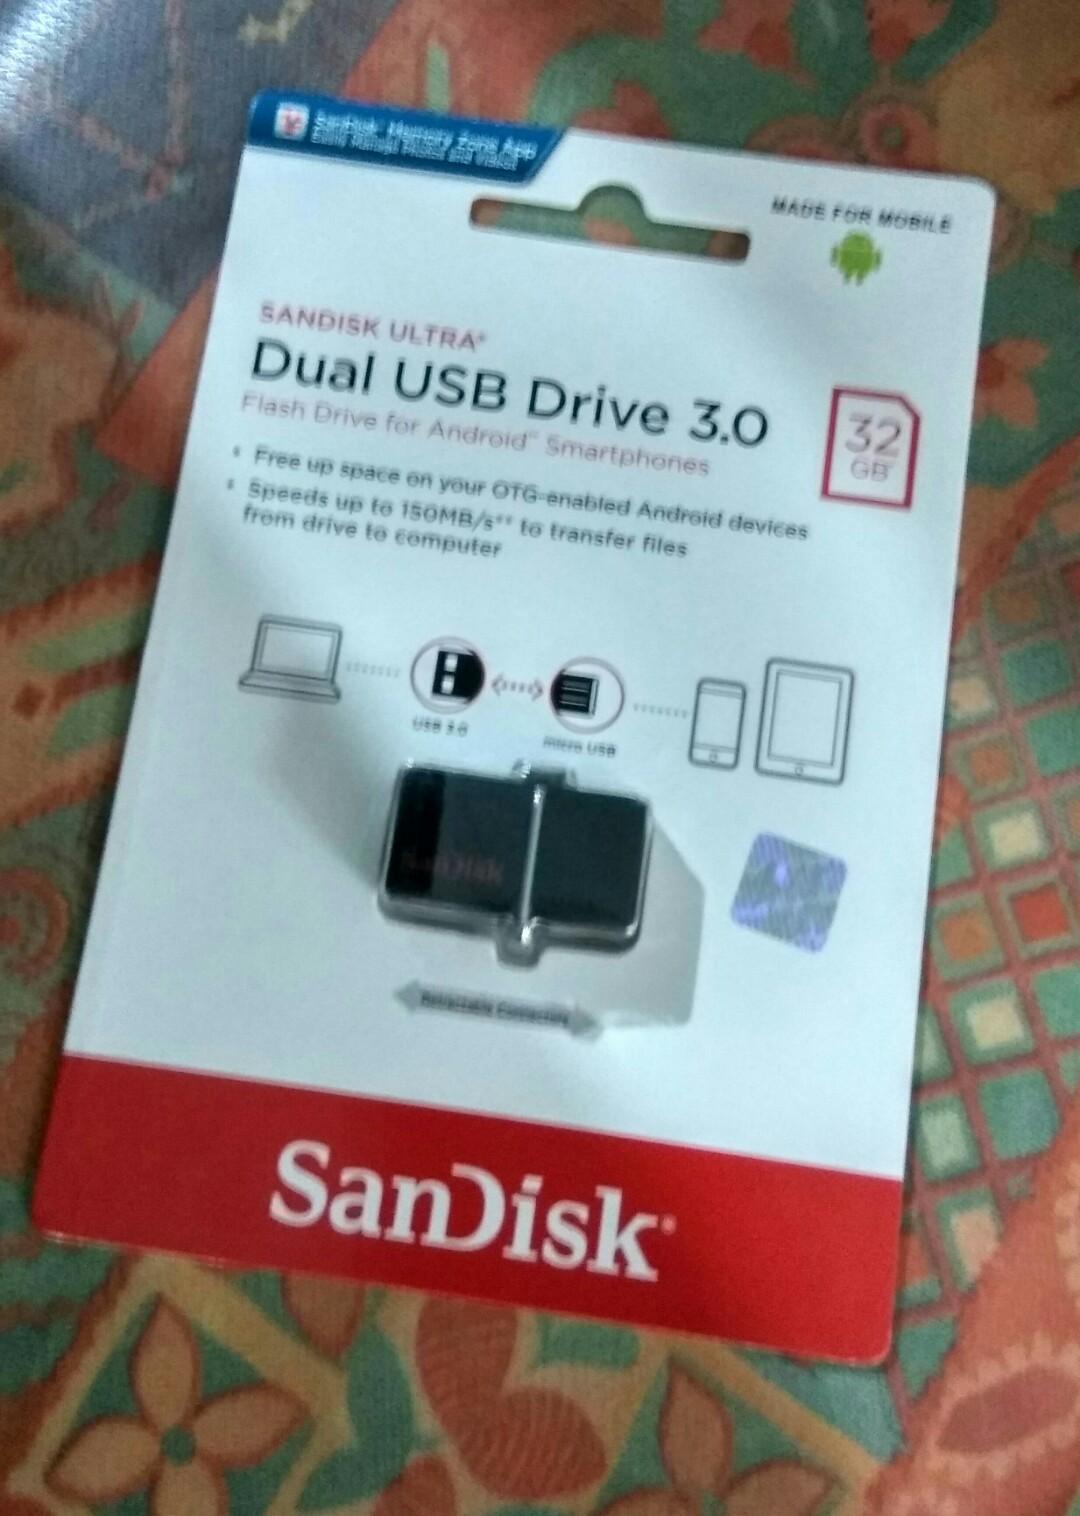 Cek Harga Baru Sandisk Flashdisk Usb 3 Otg 32gb Up To 130 Mb S Ori